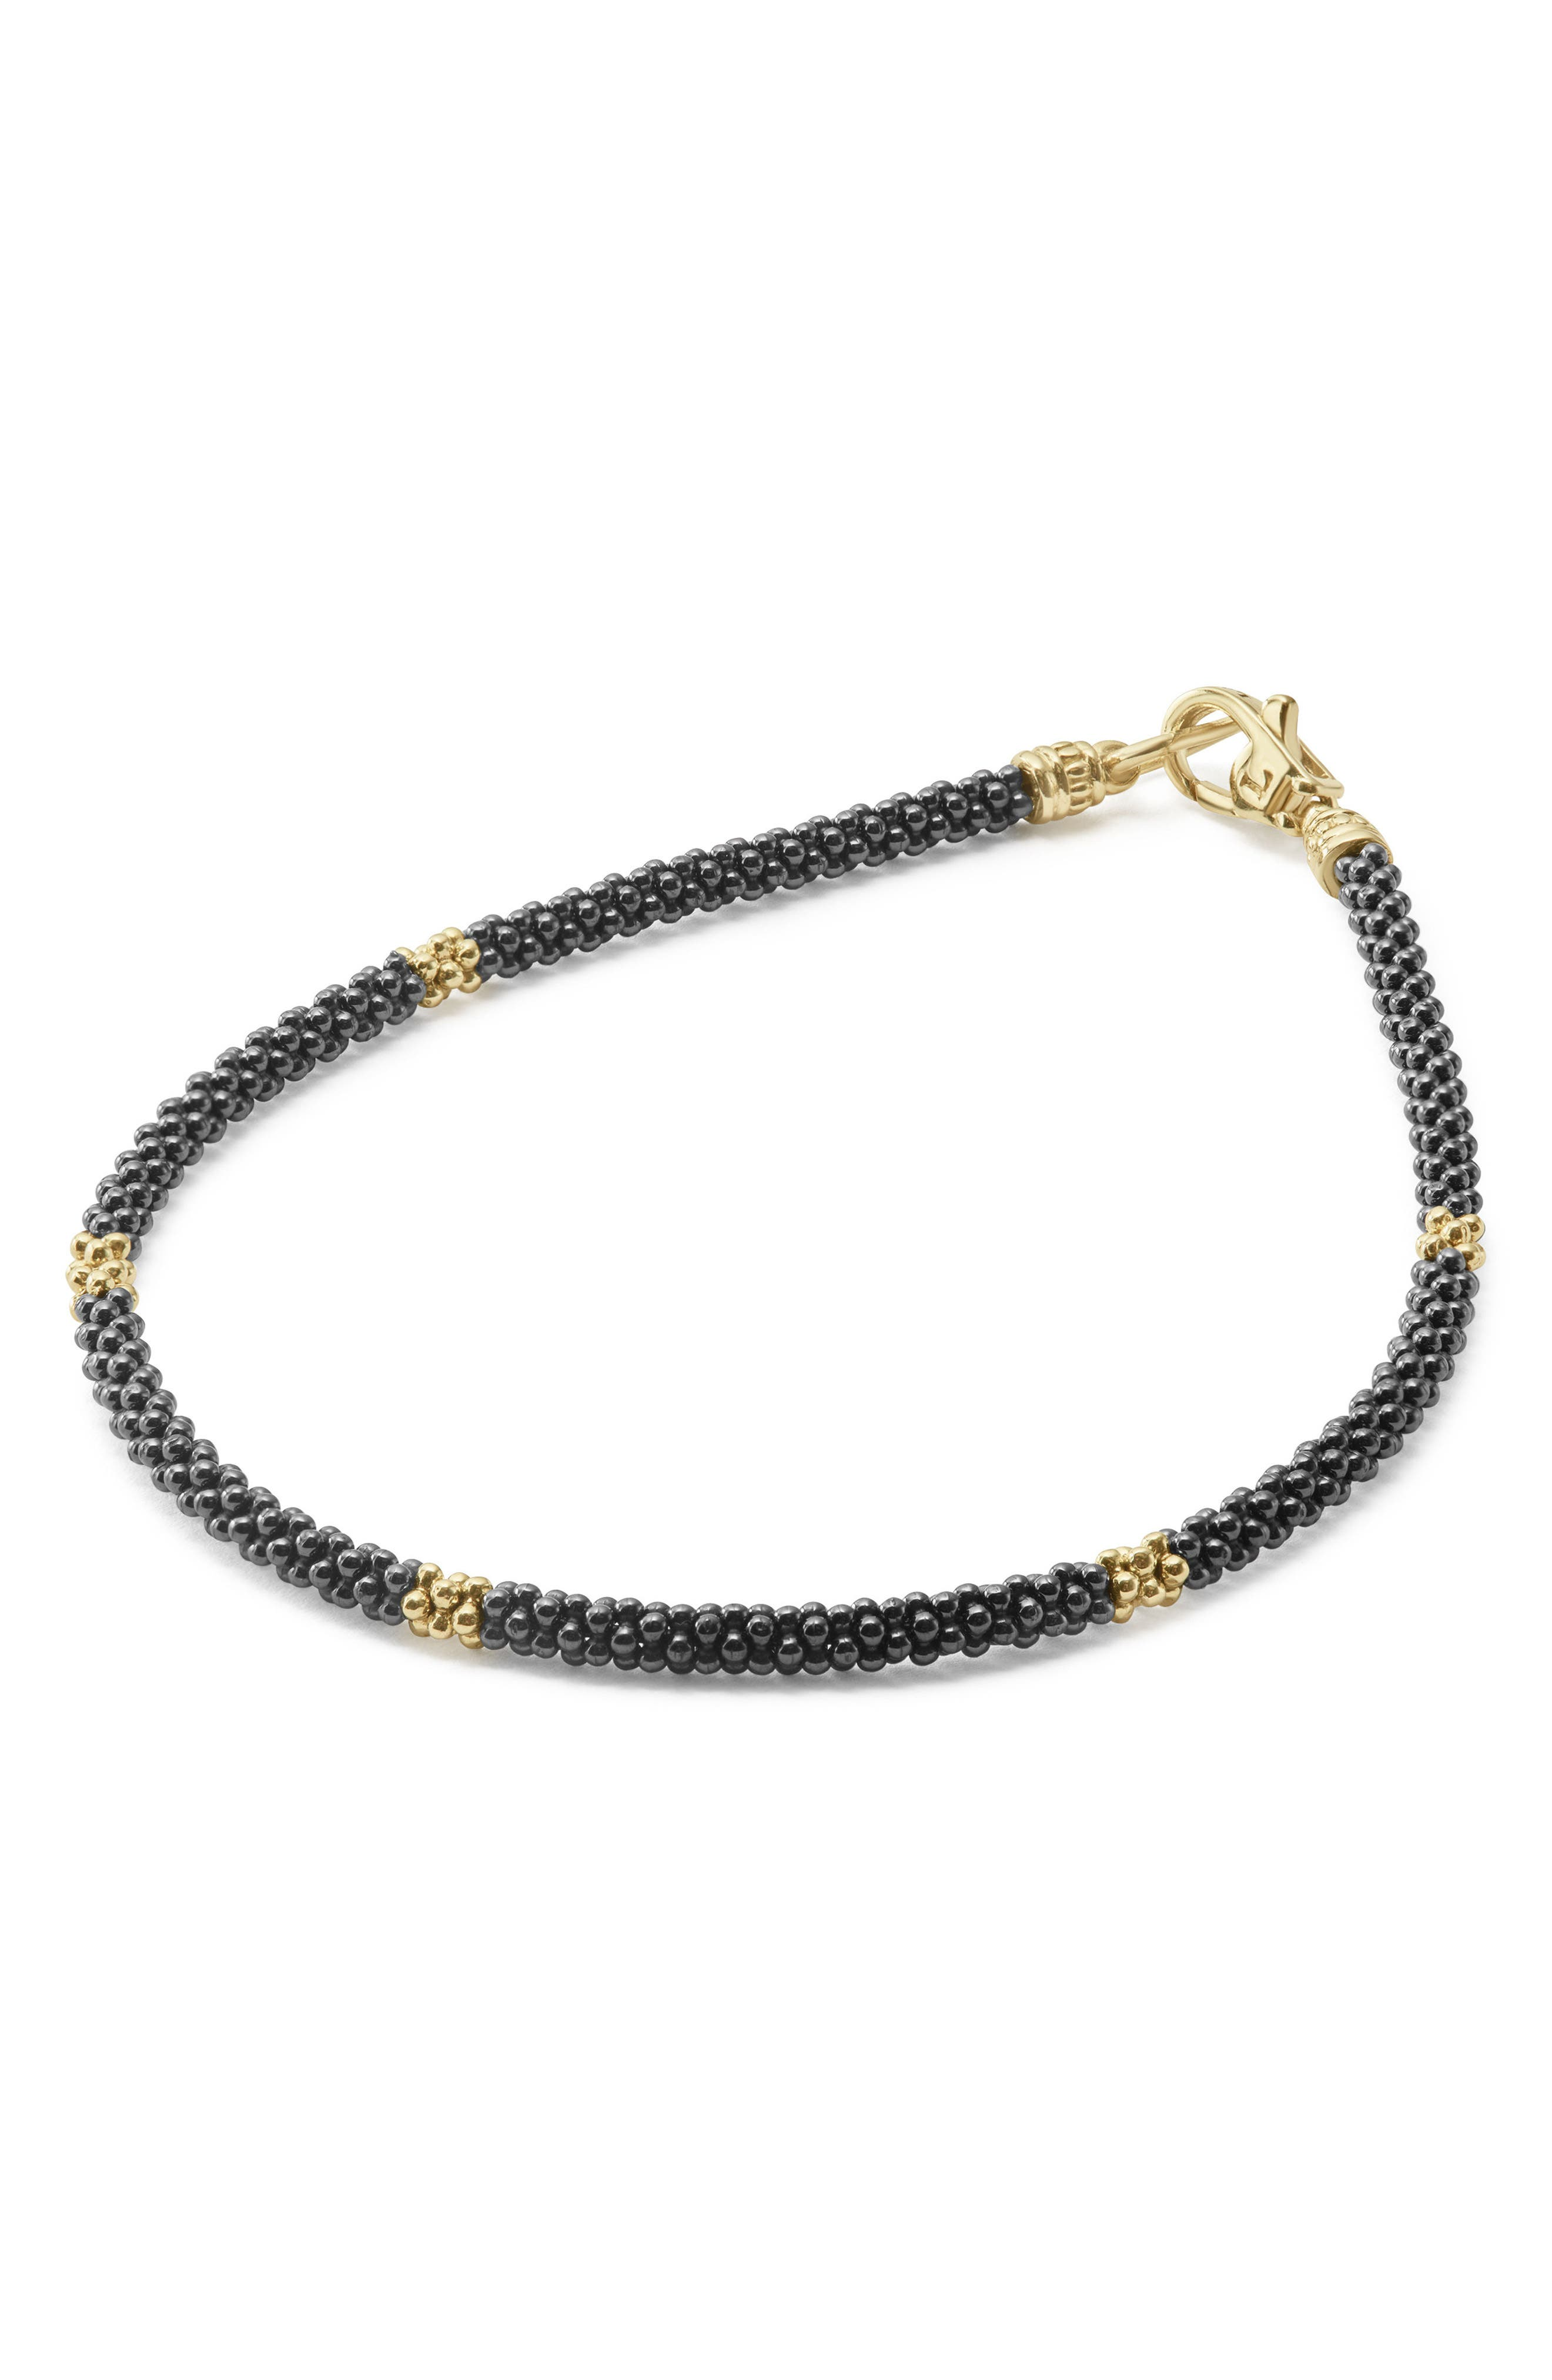 Gold & Black Caviar Rope Bracelet,                             Alternate thumbnail 4, color,                             Gold